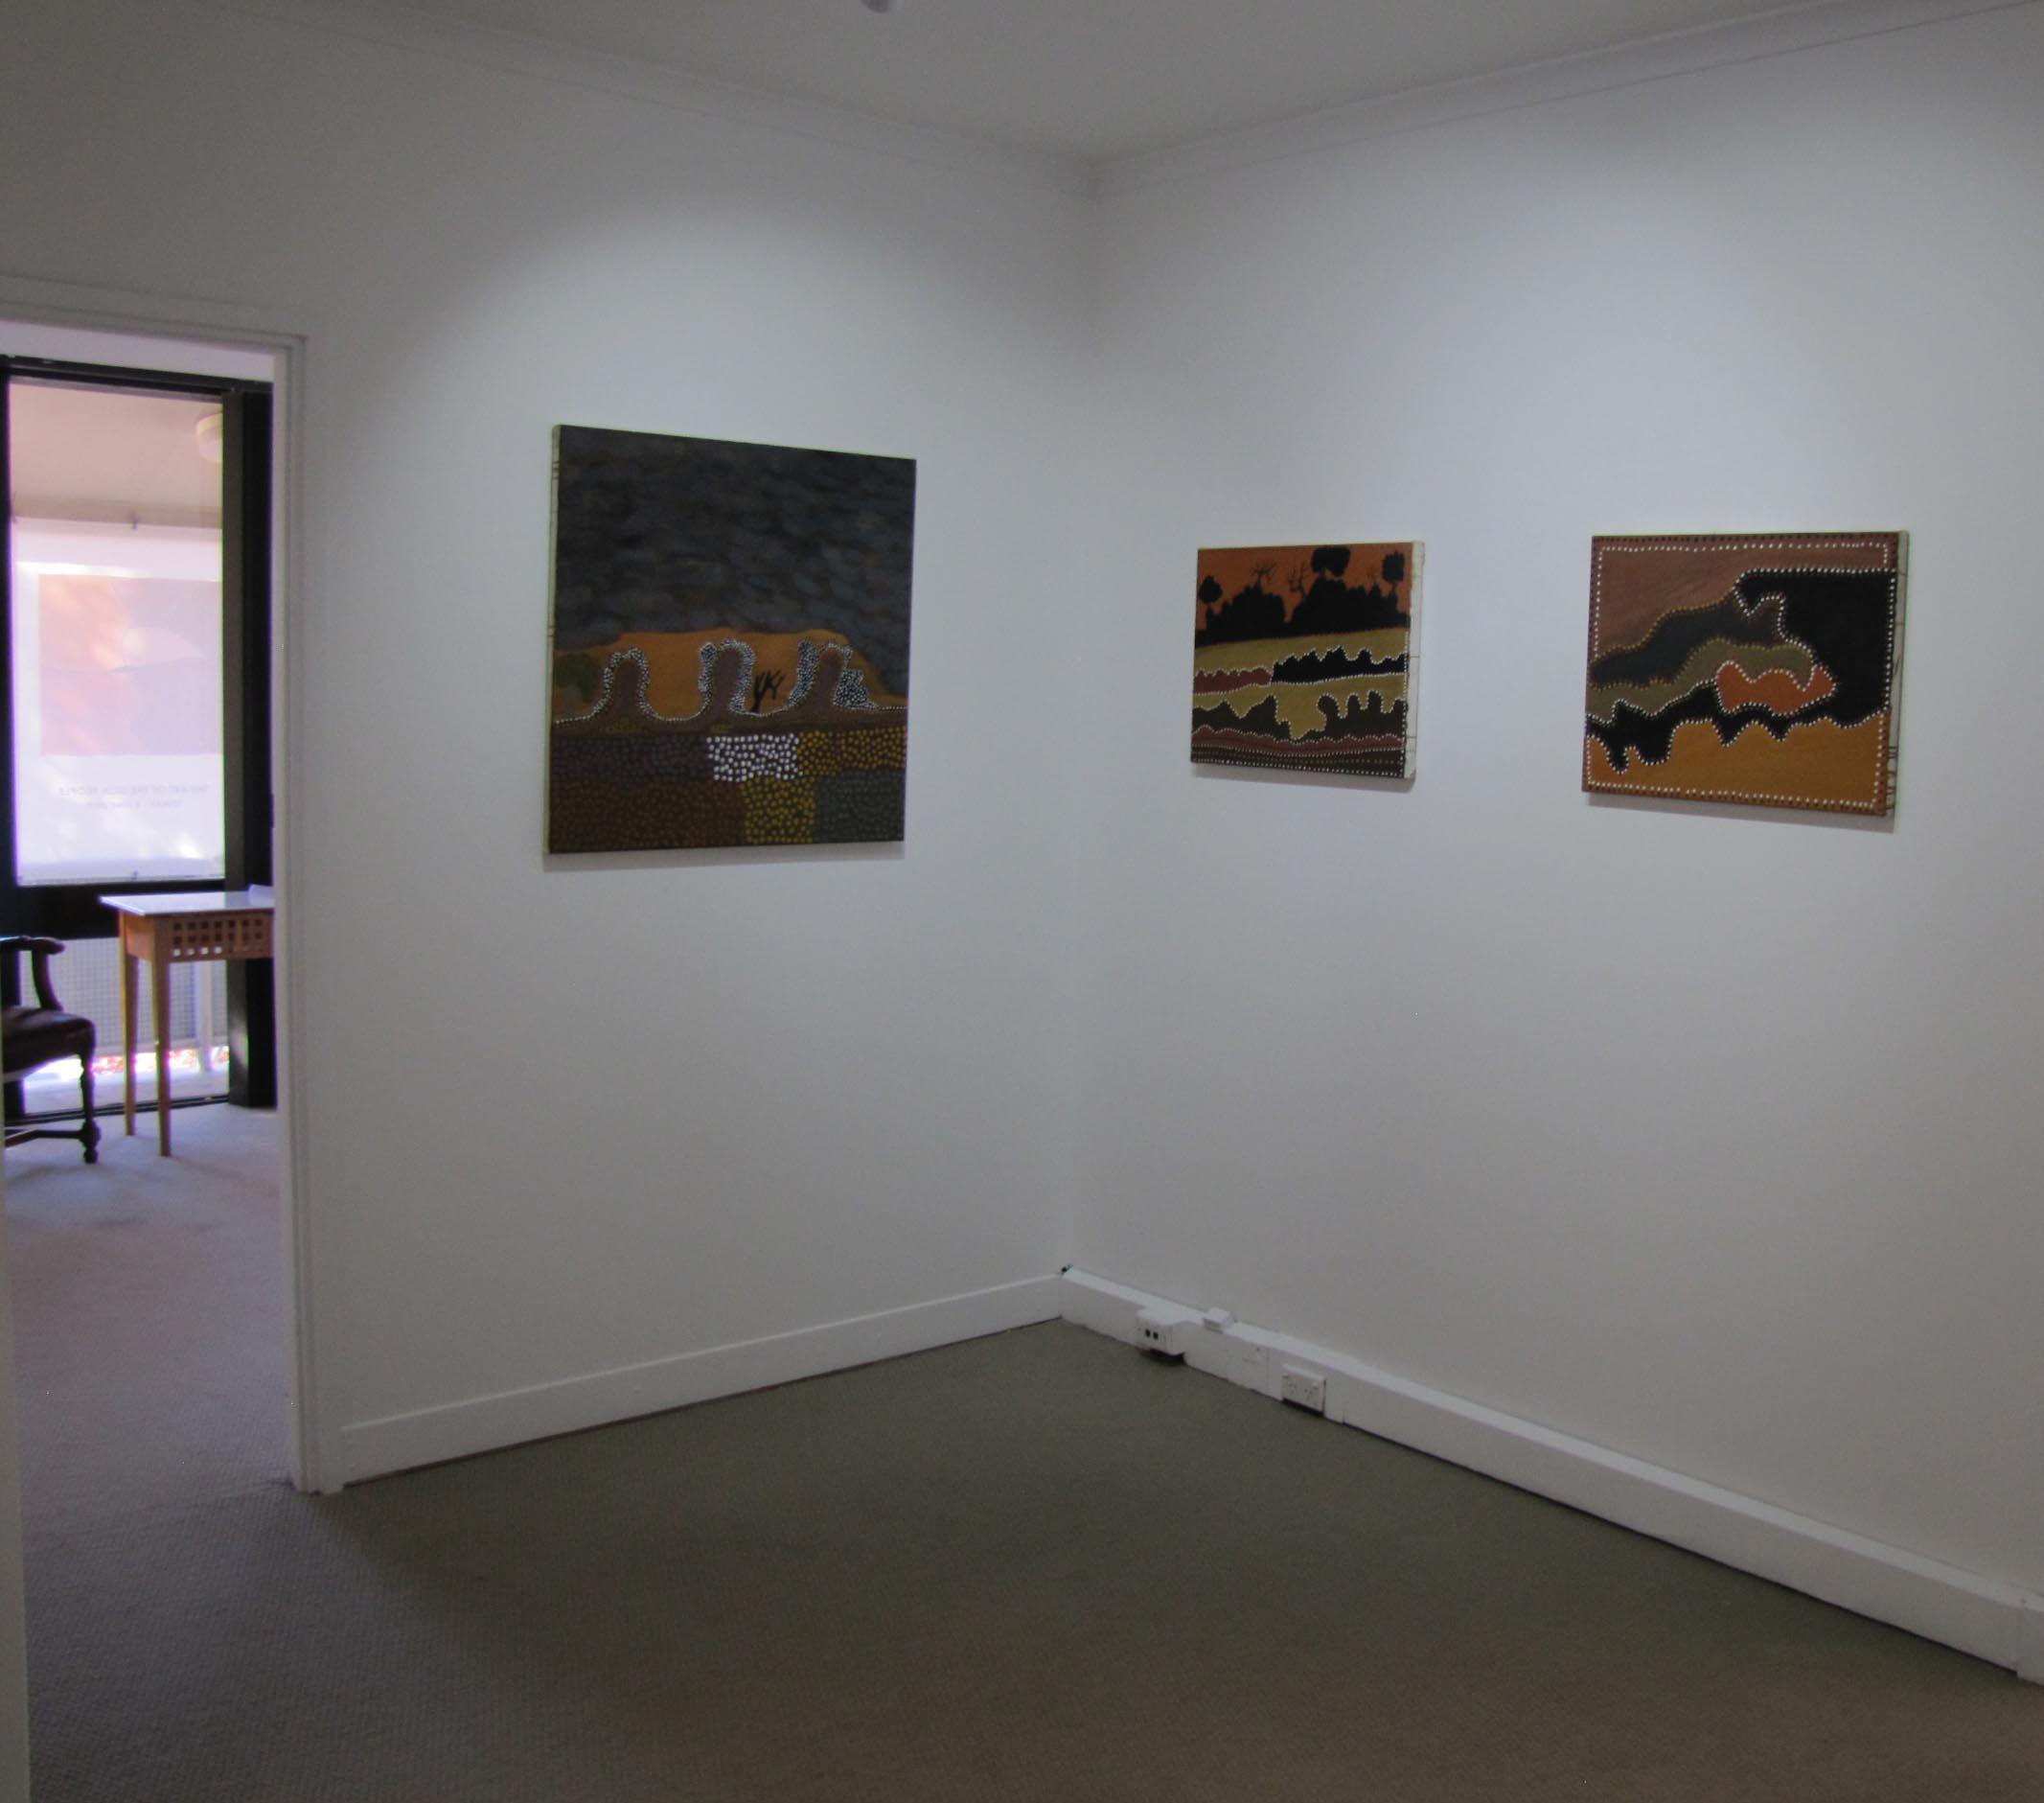 NSG. Warmun 4 exhibition. Exhibition views 9.jpg